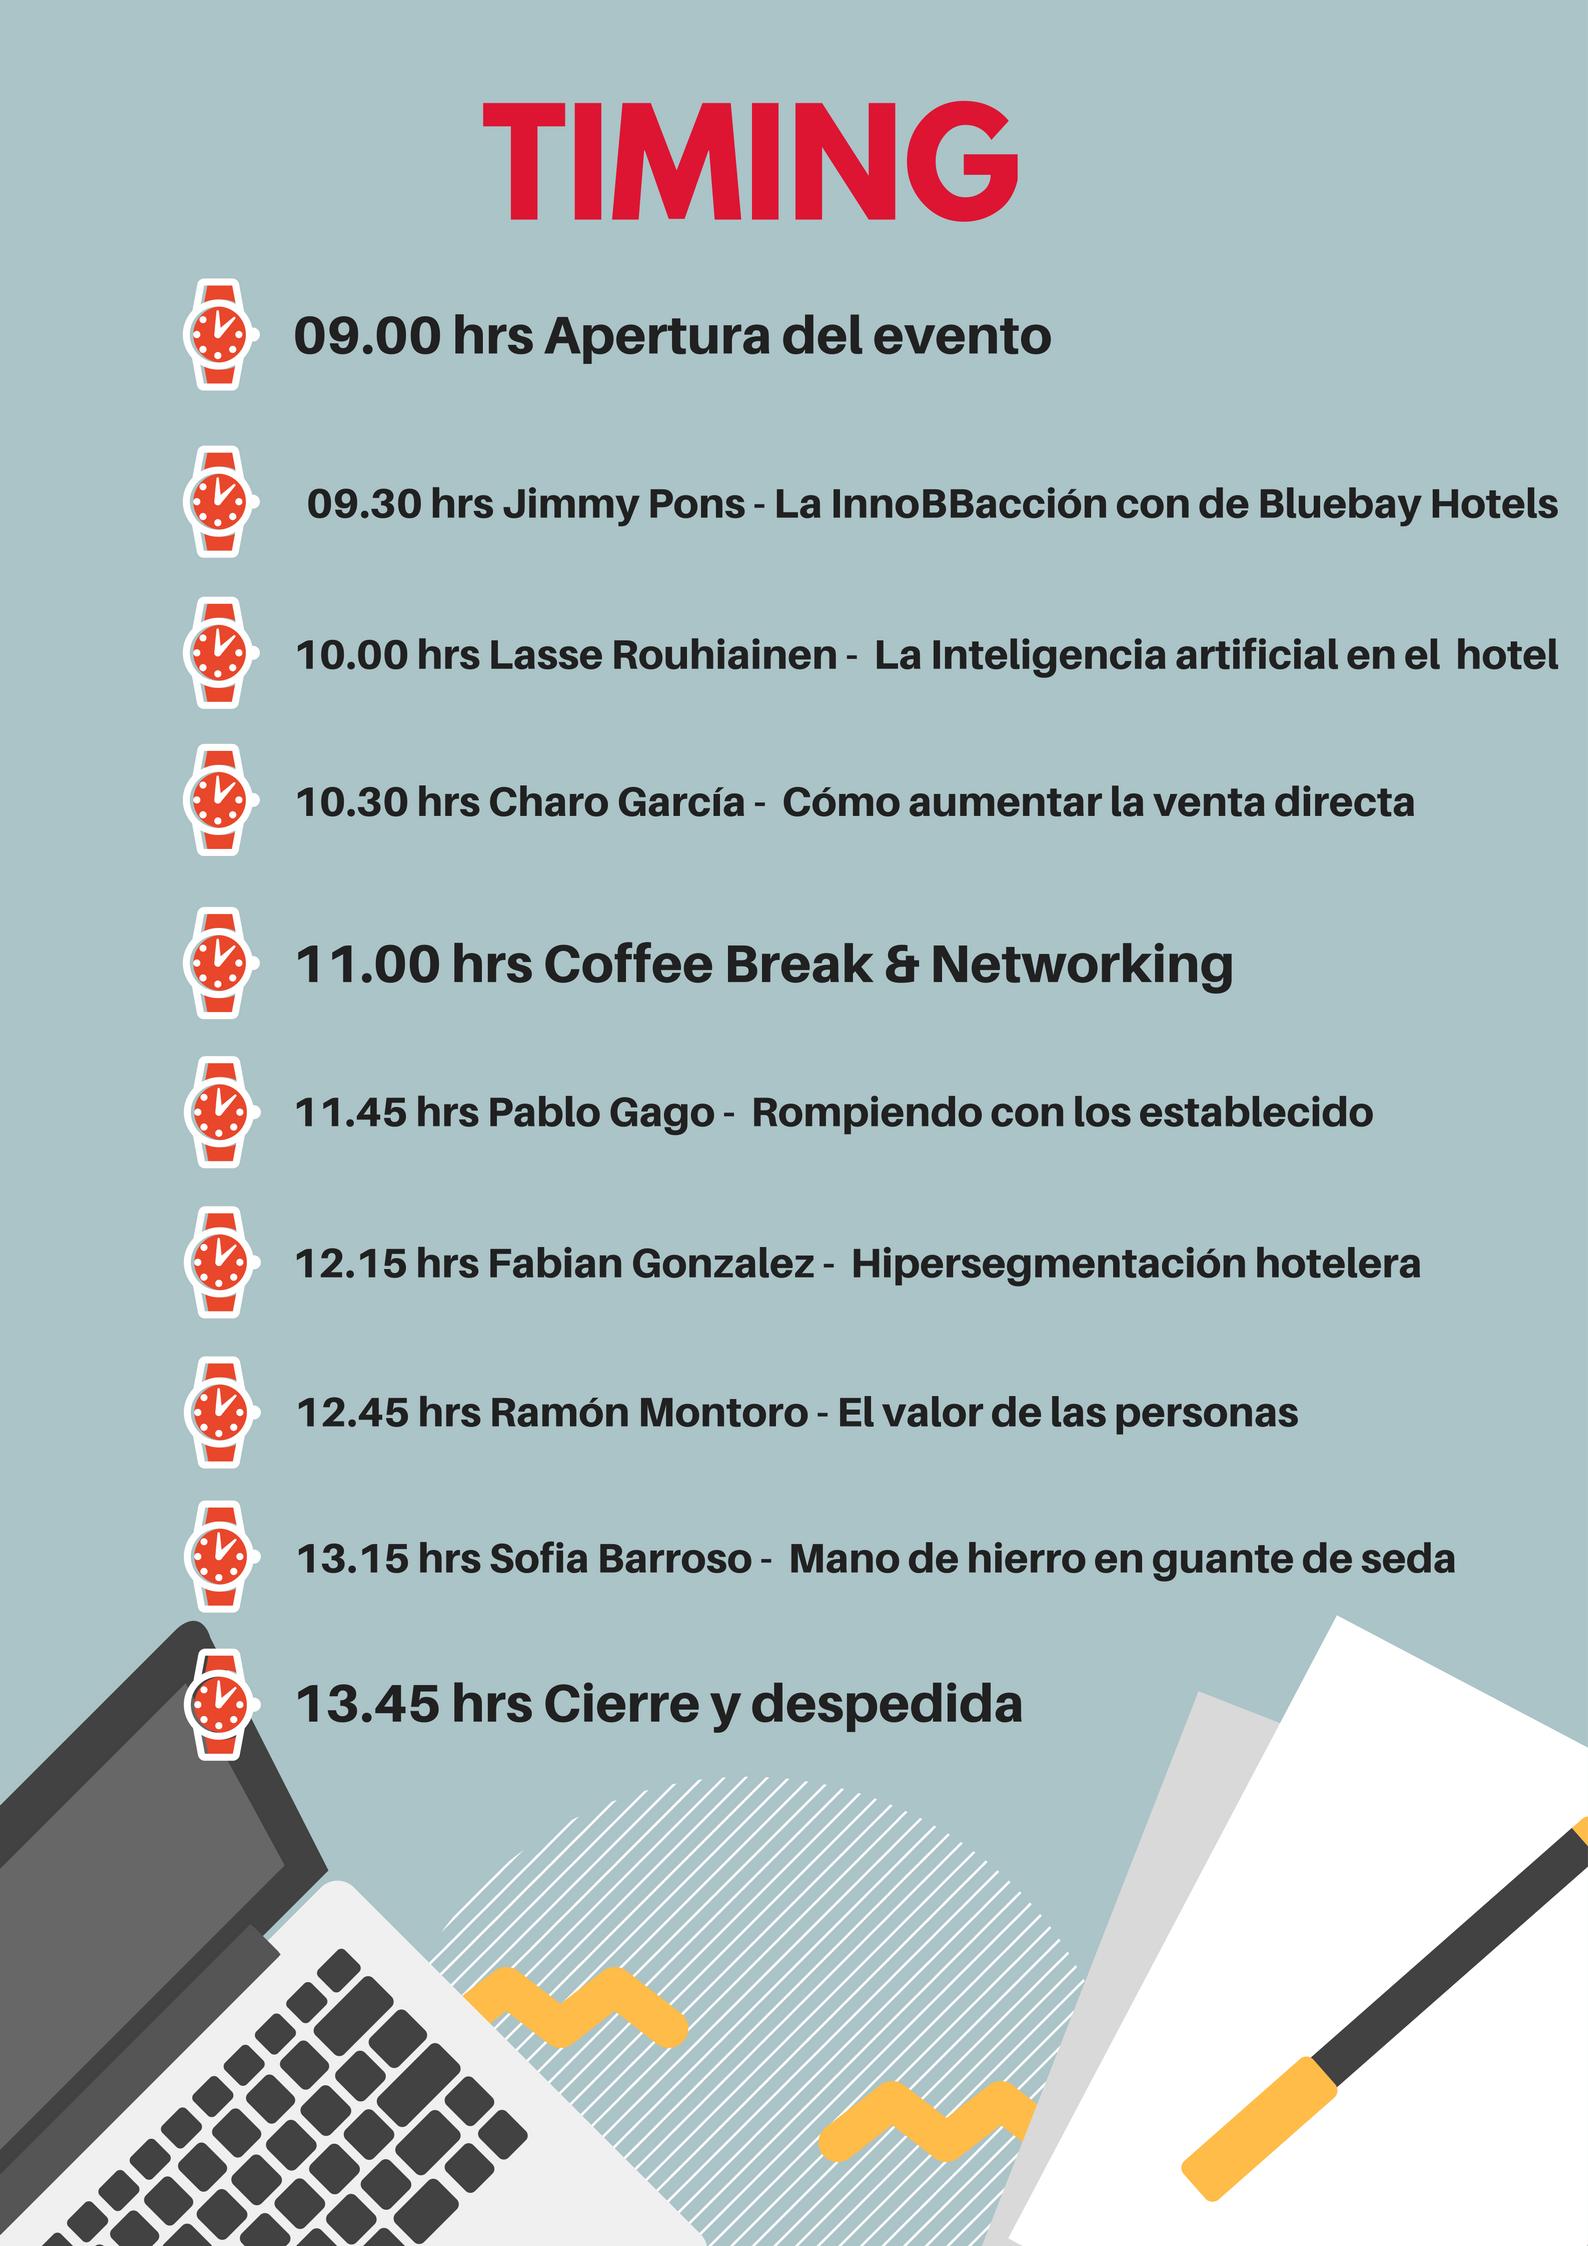 Hotel Innovacion 2017 Timing